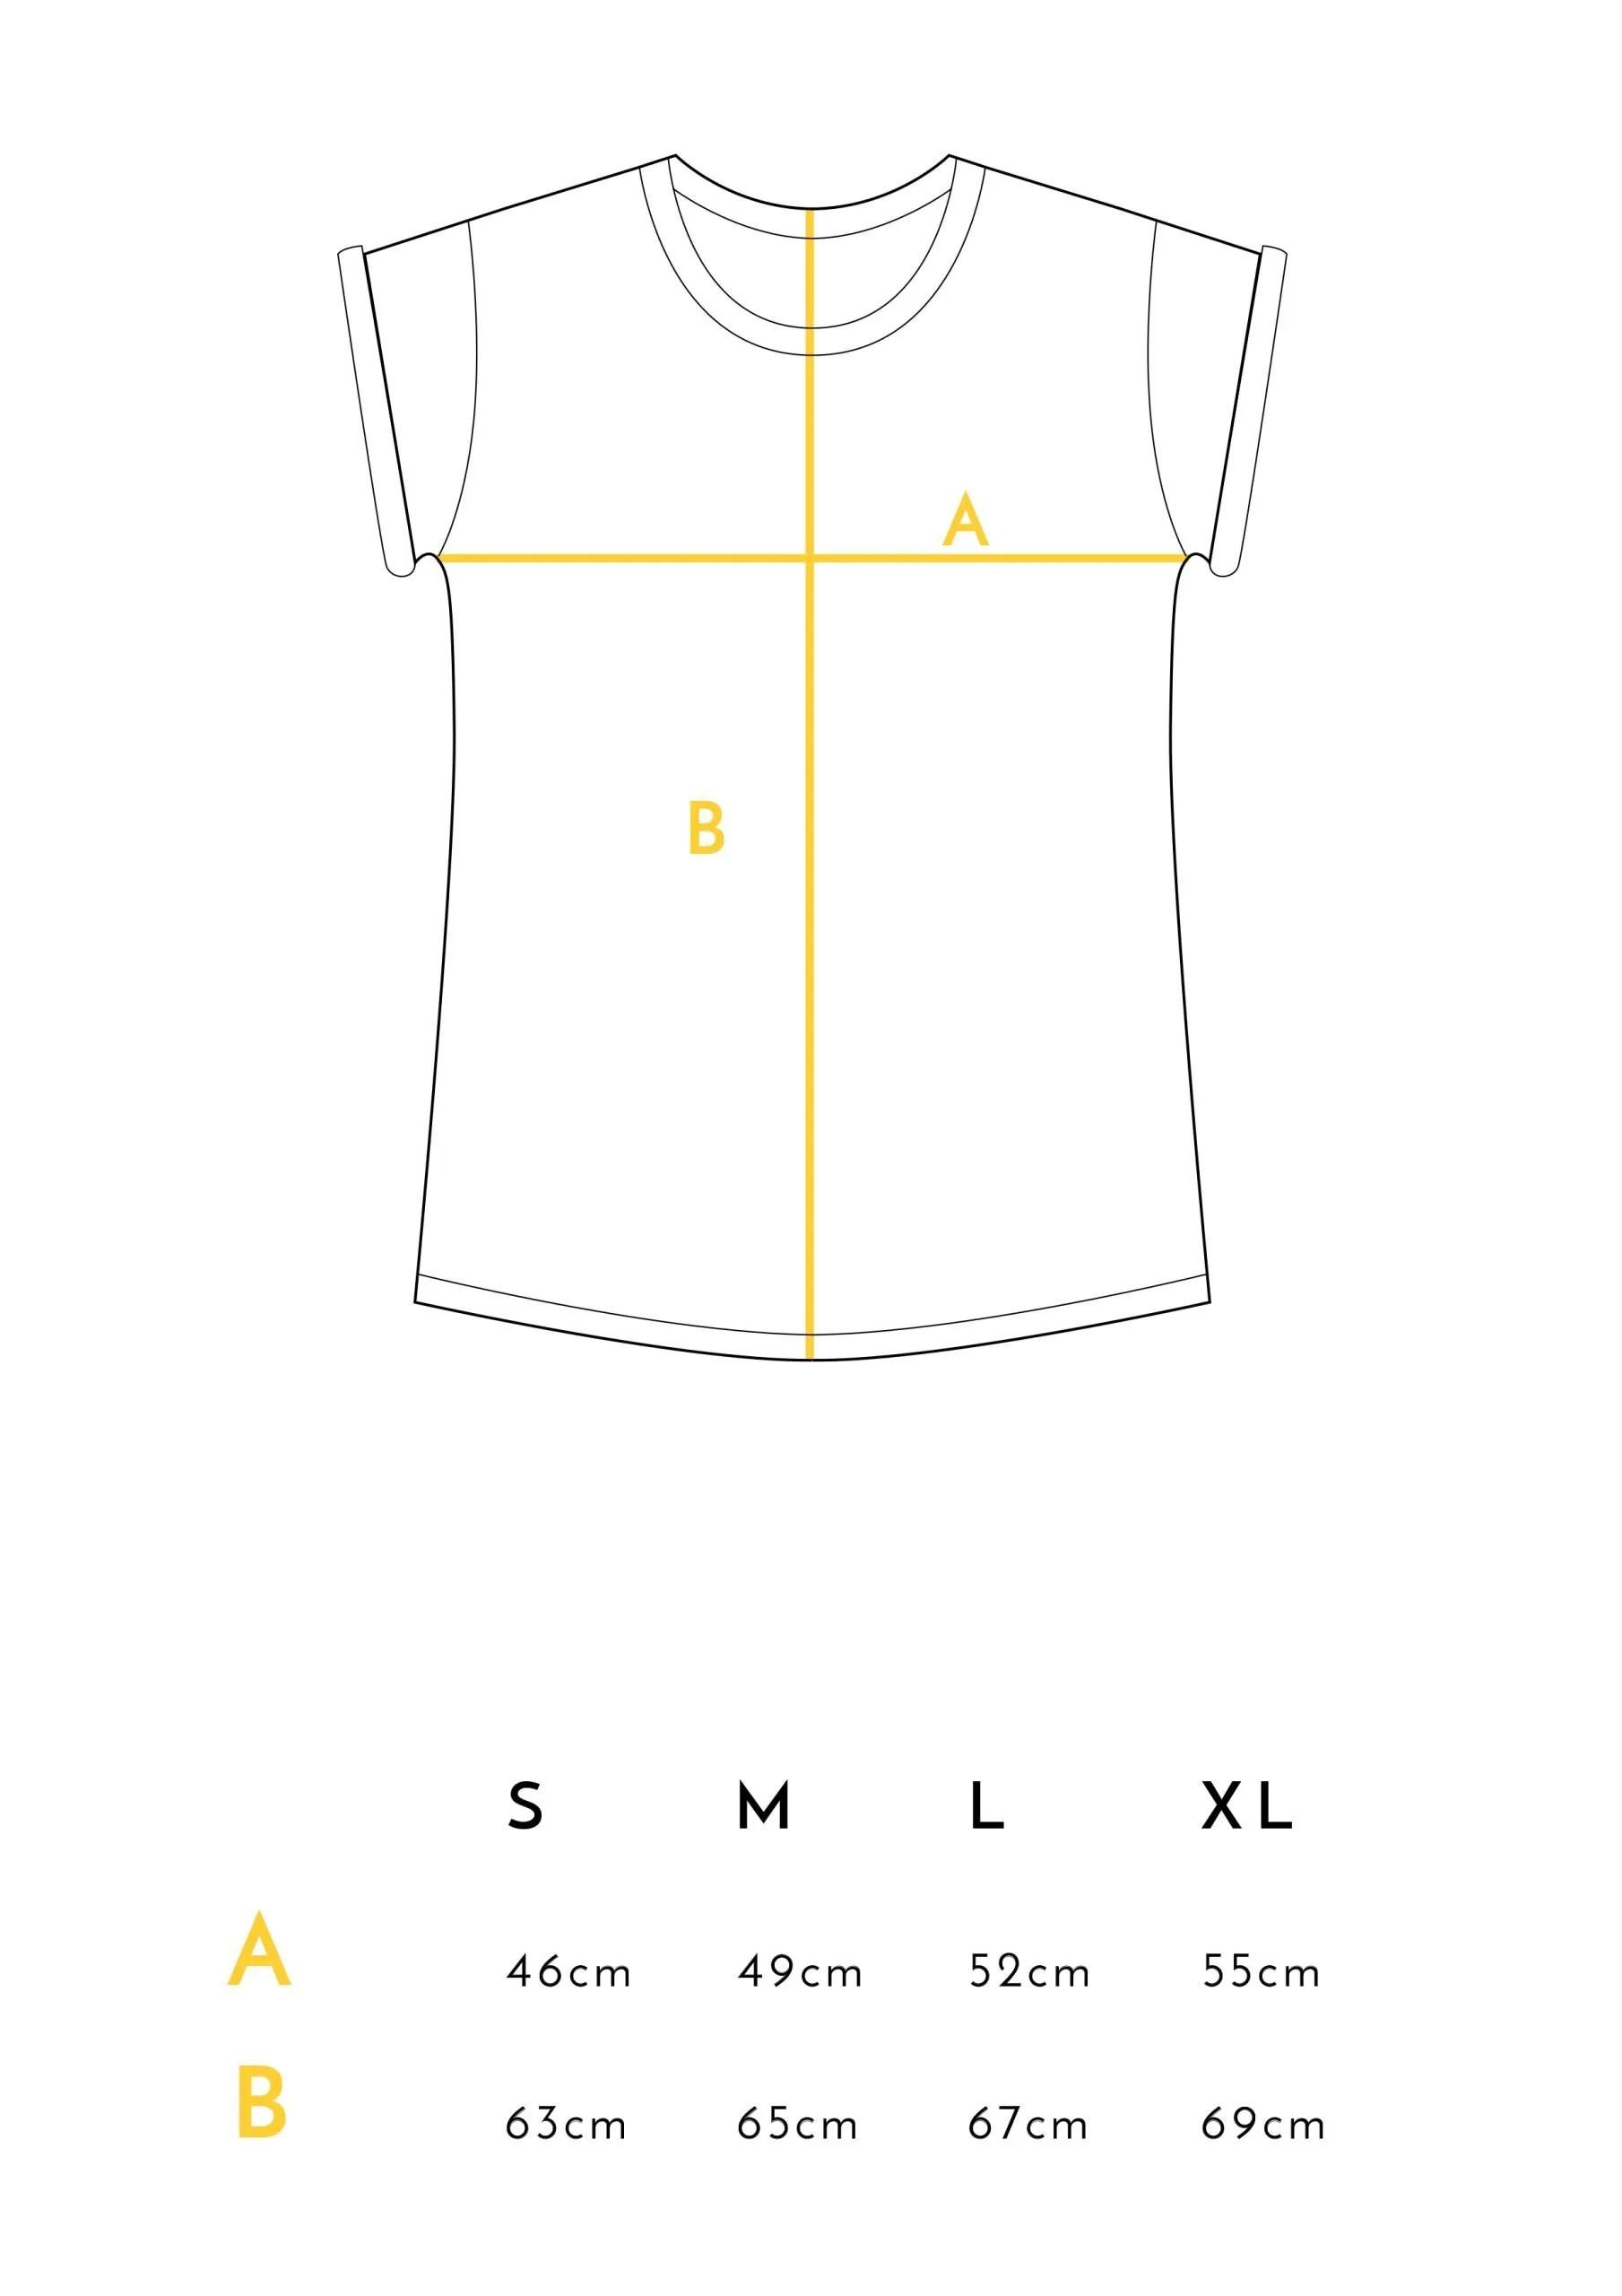 Medidas Camisetas Detucuerpocrecenflores Crisálida